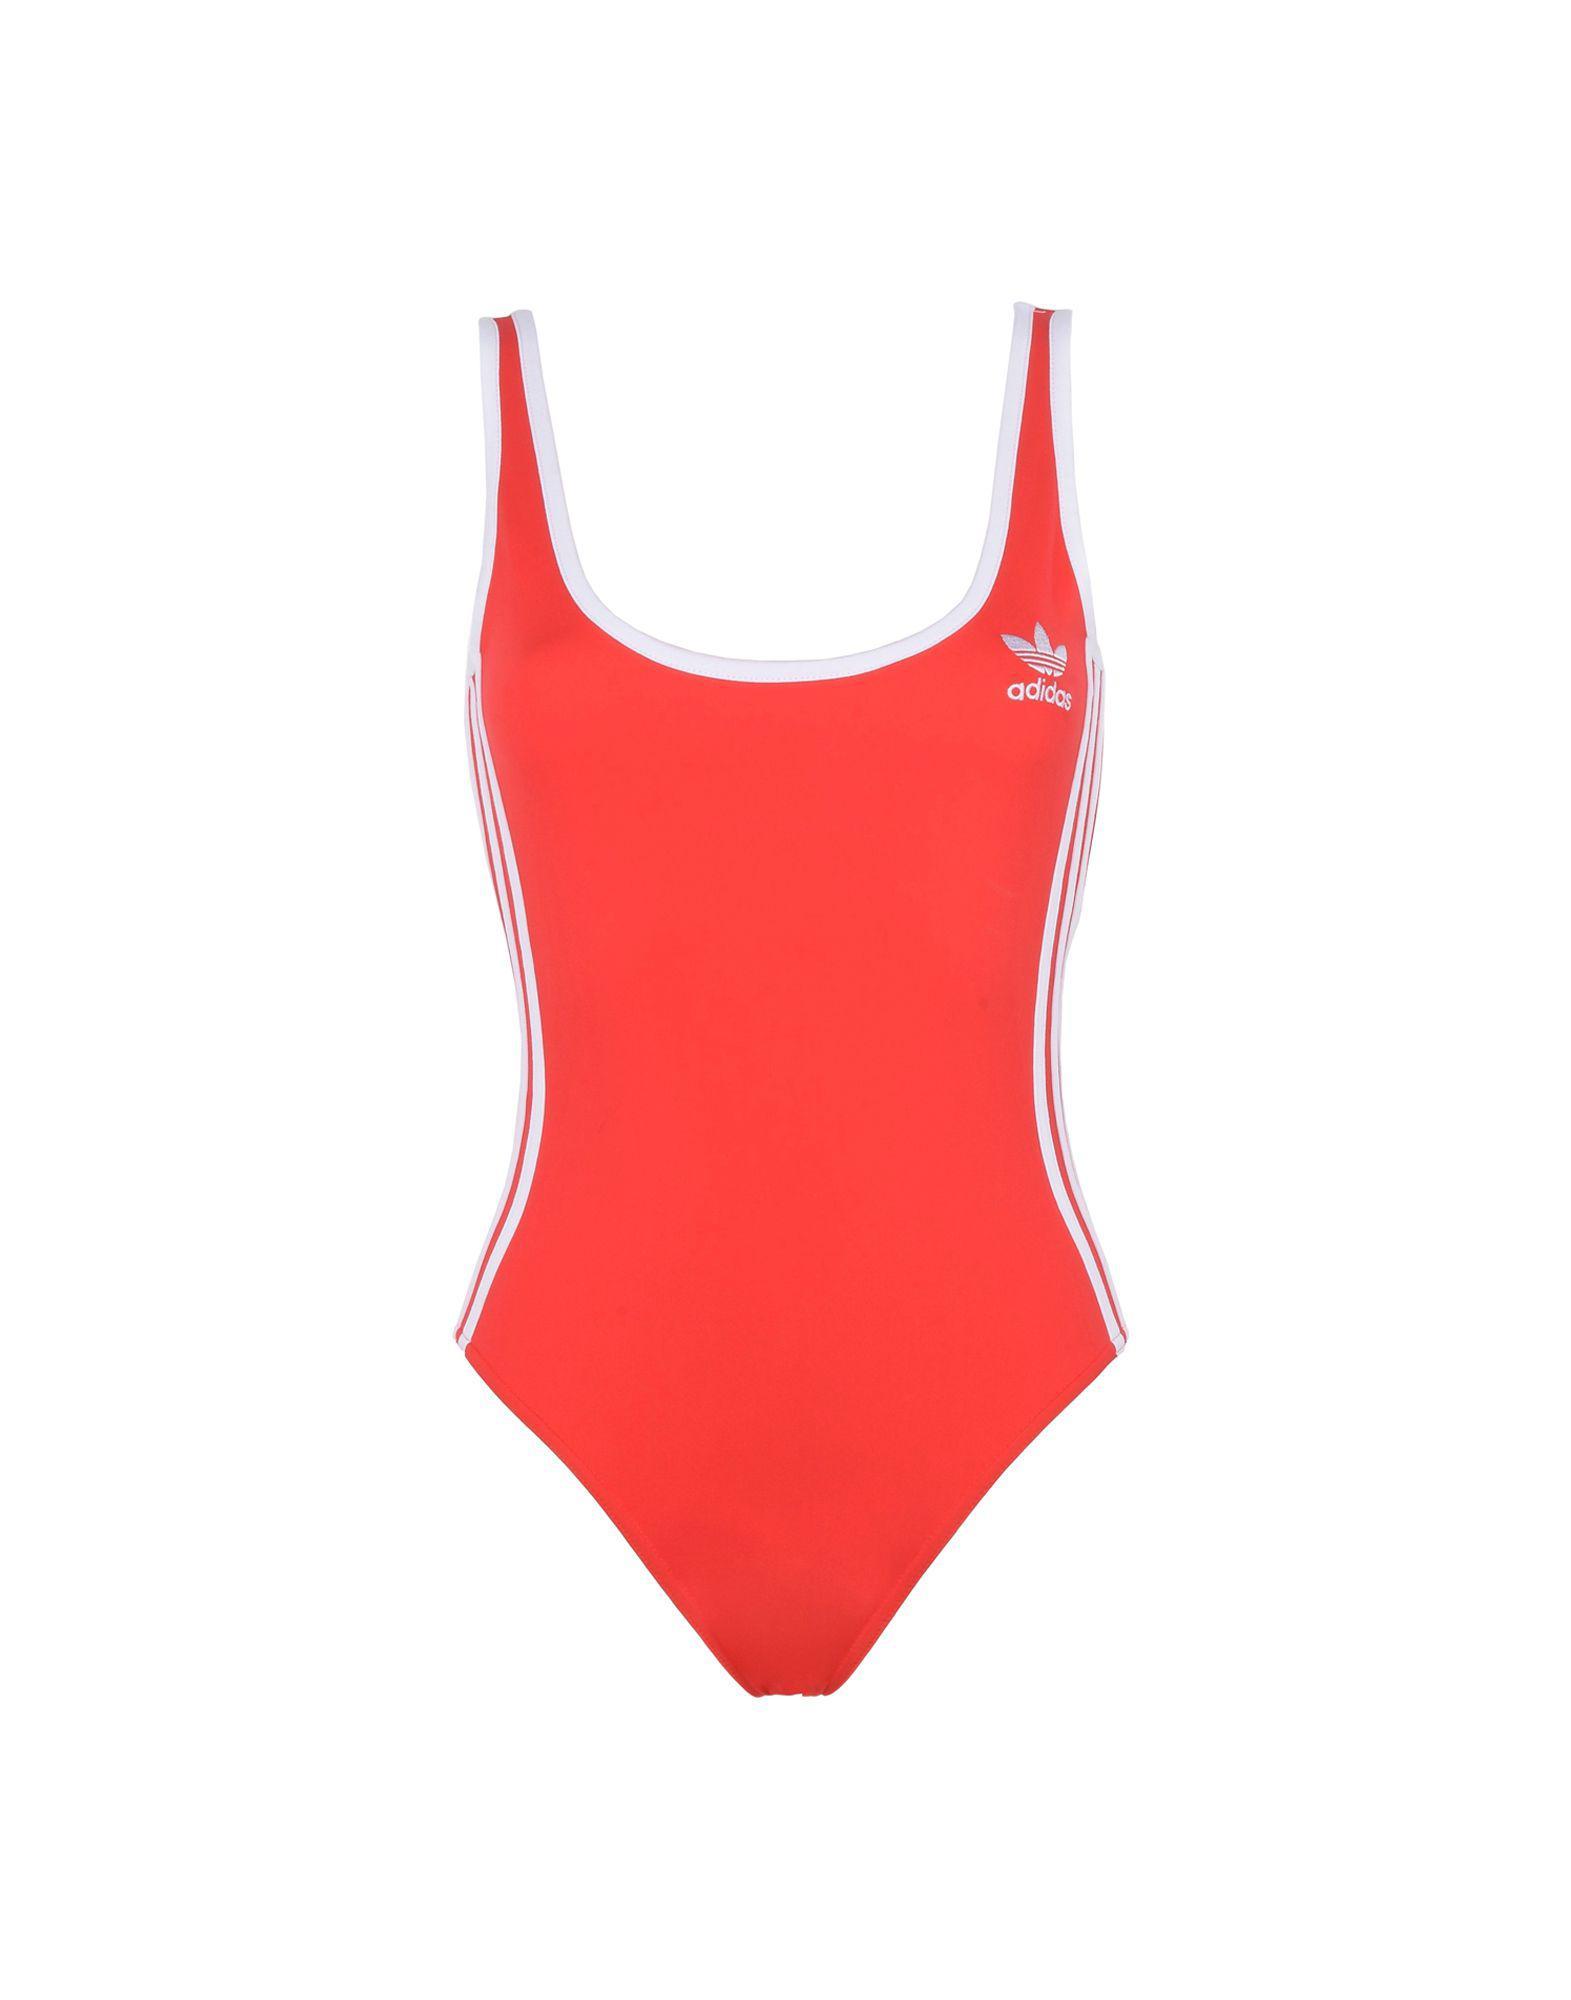 e9b5710a70 adidas Originals Bodysuit in Red - Lyst